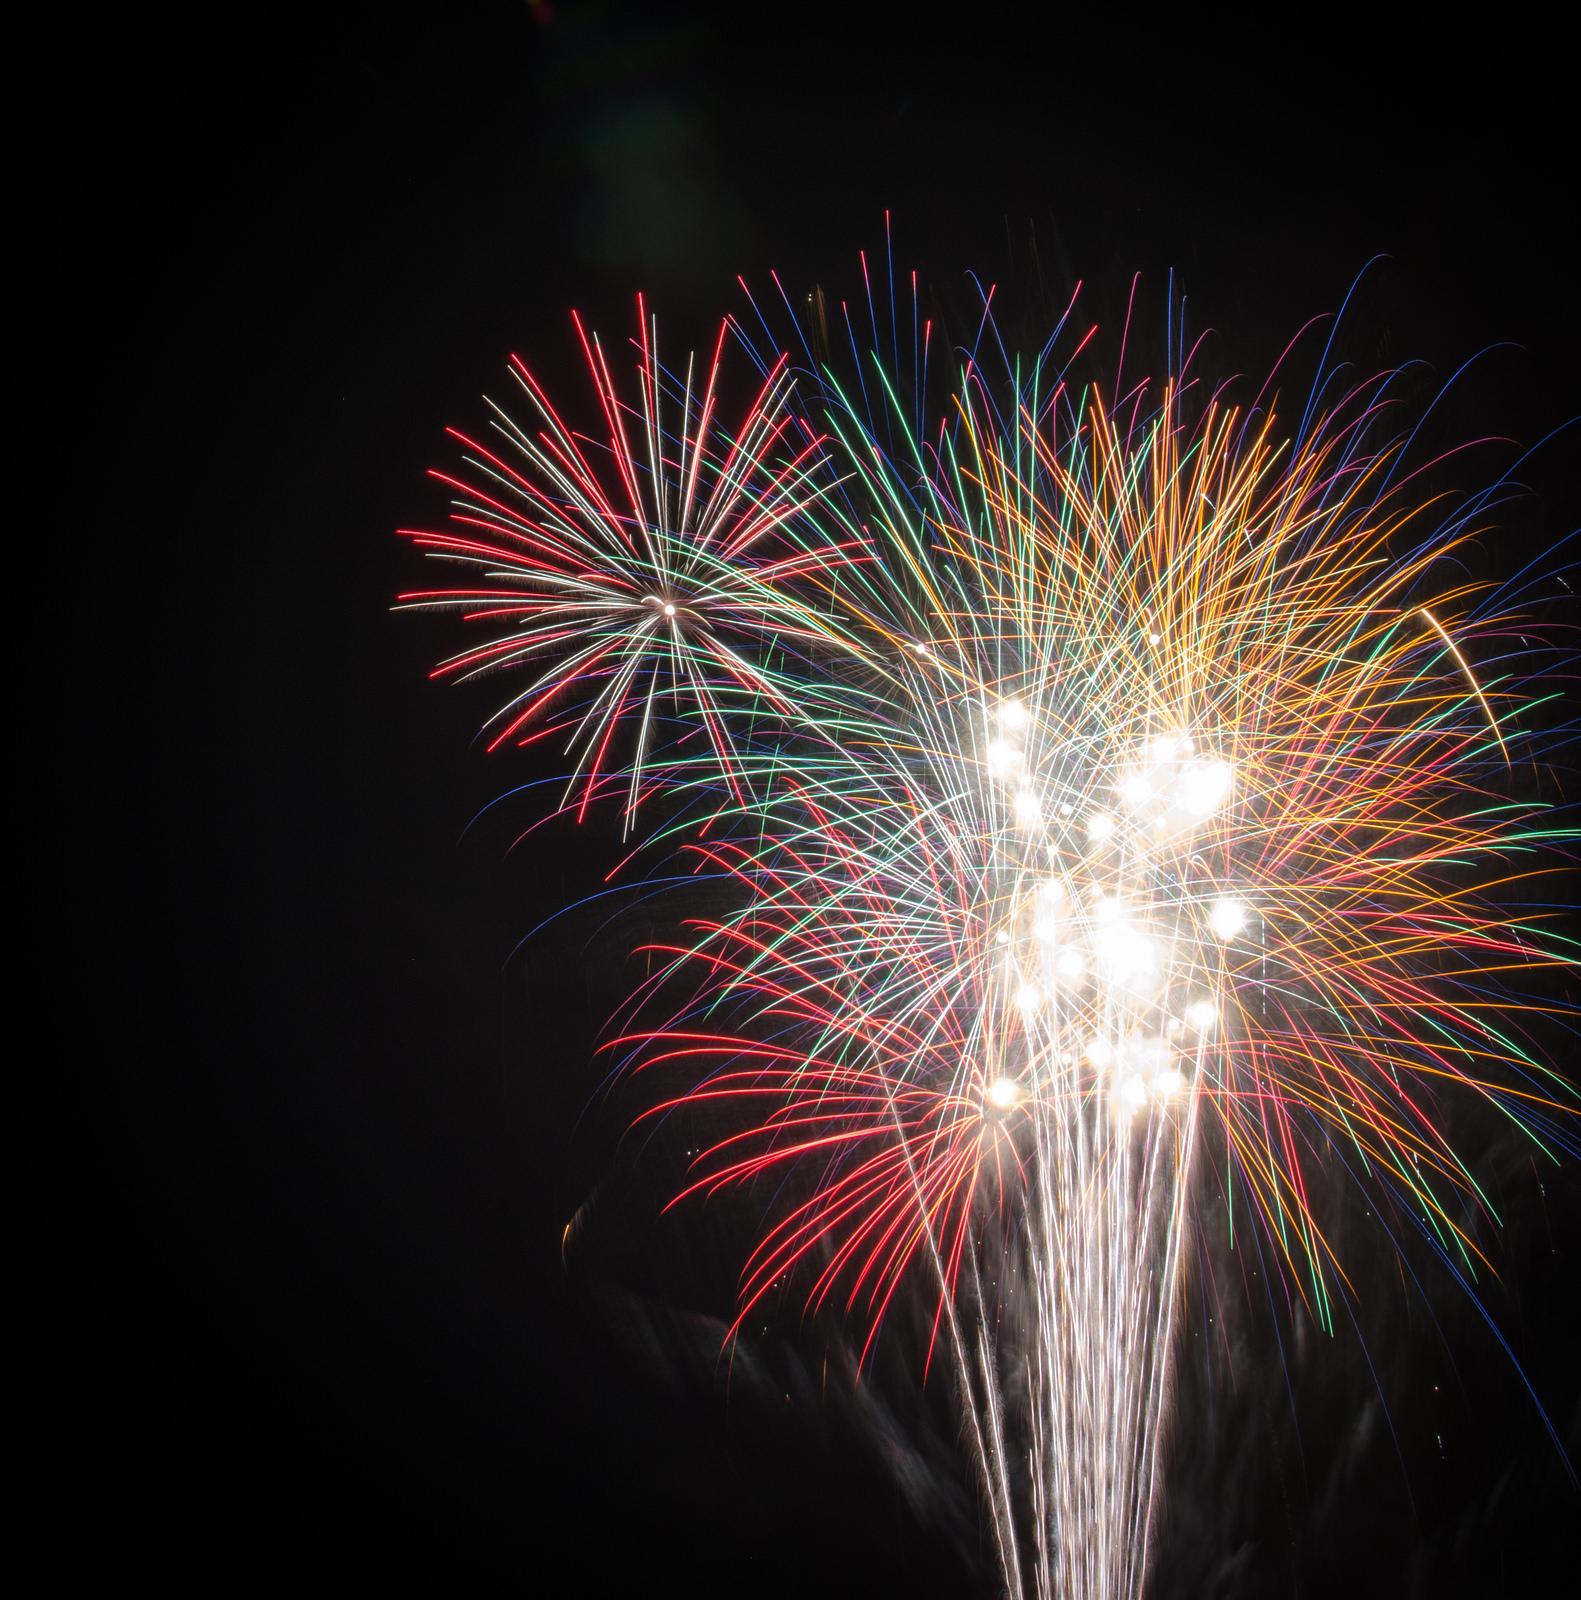 How to Photograph Summer Fireworks NIKON D5100 20140701 0682